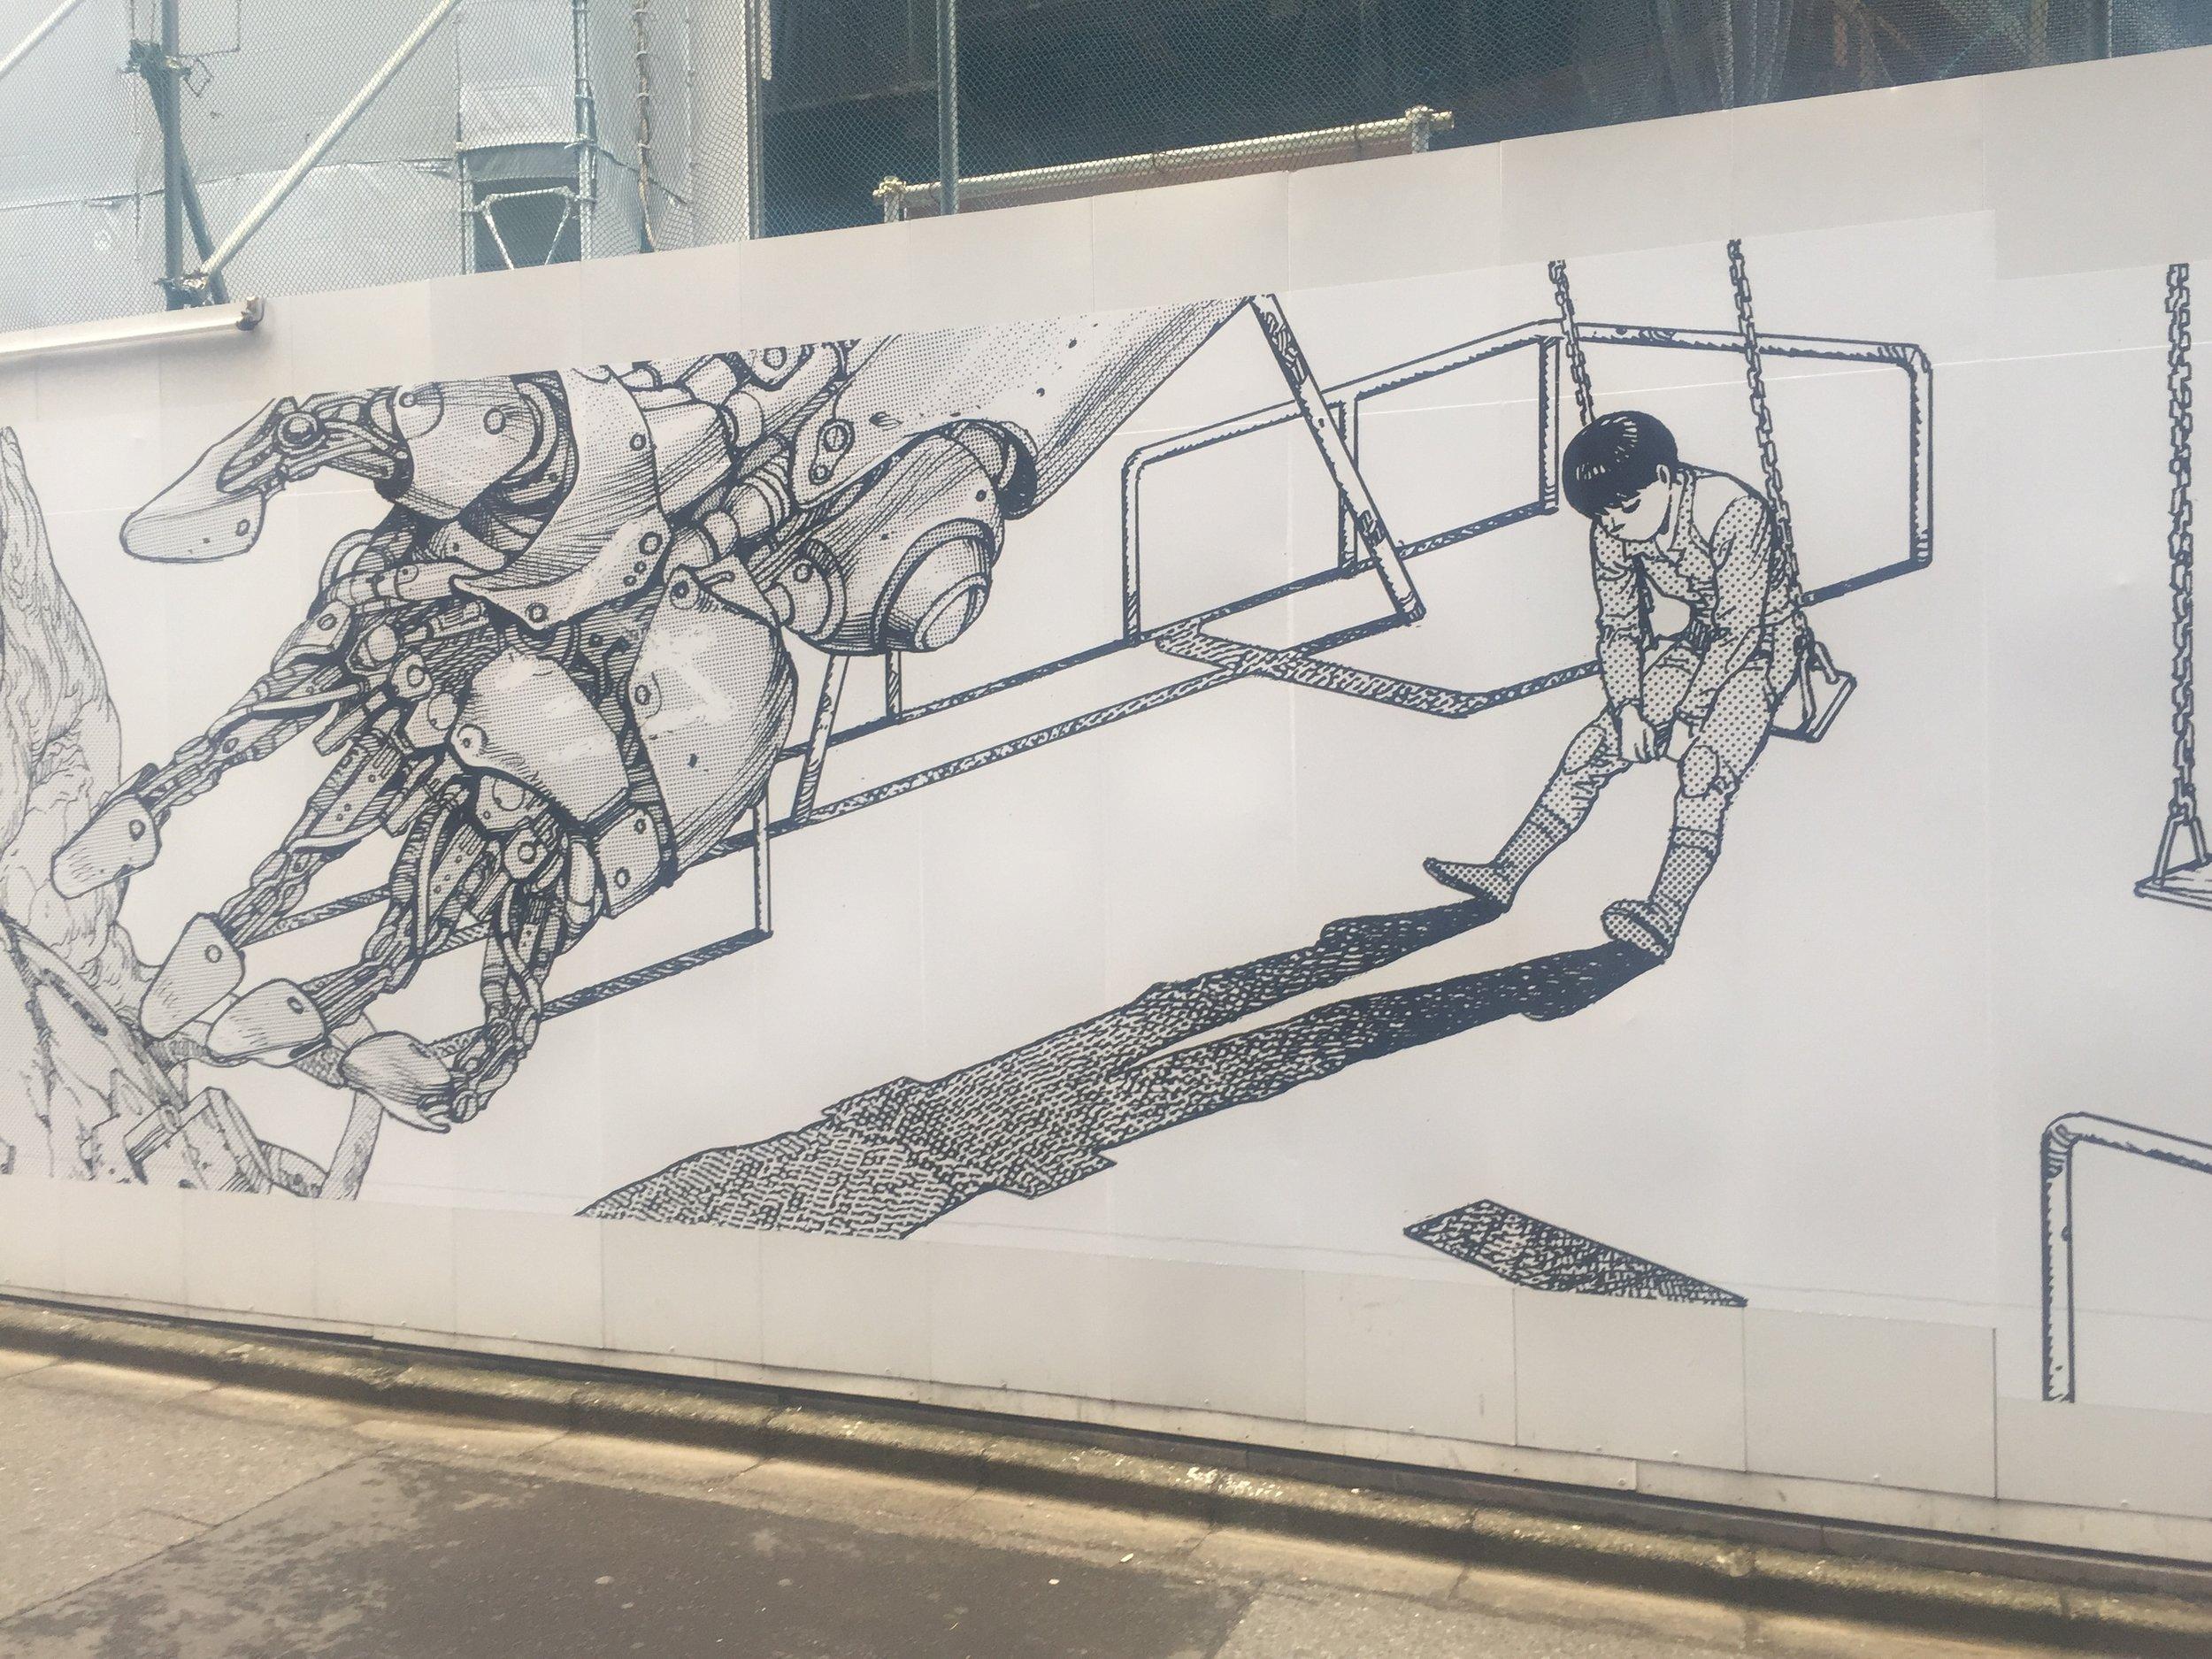 akira construction site display shibuya tokyo.JPG